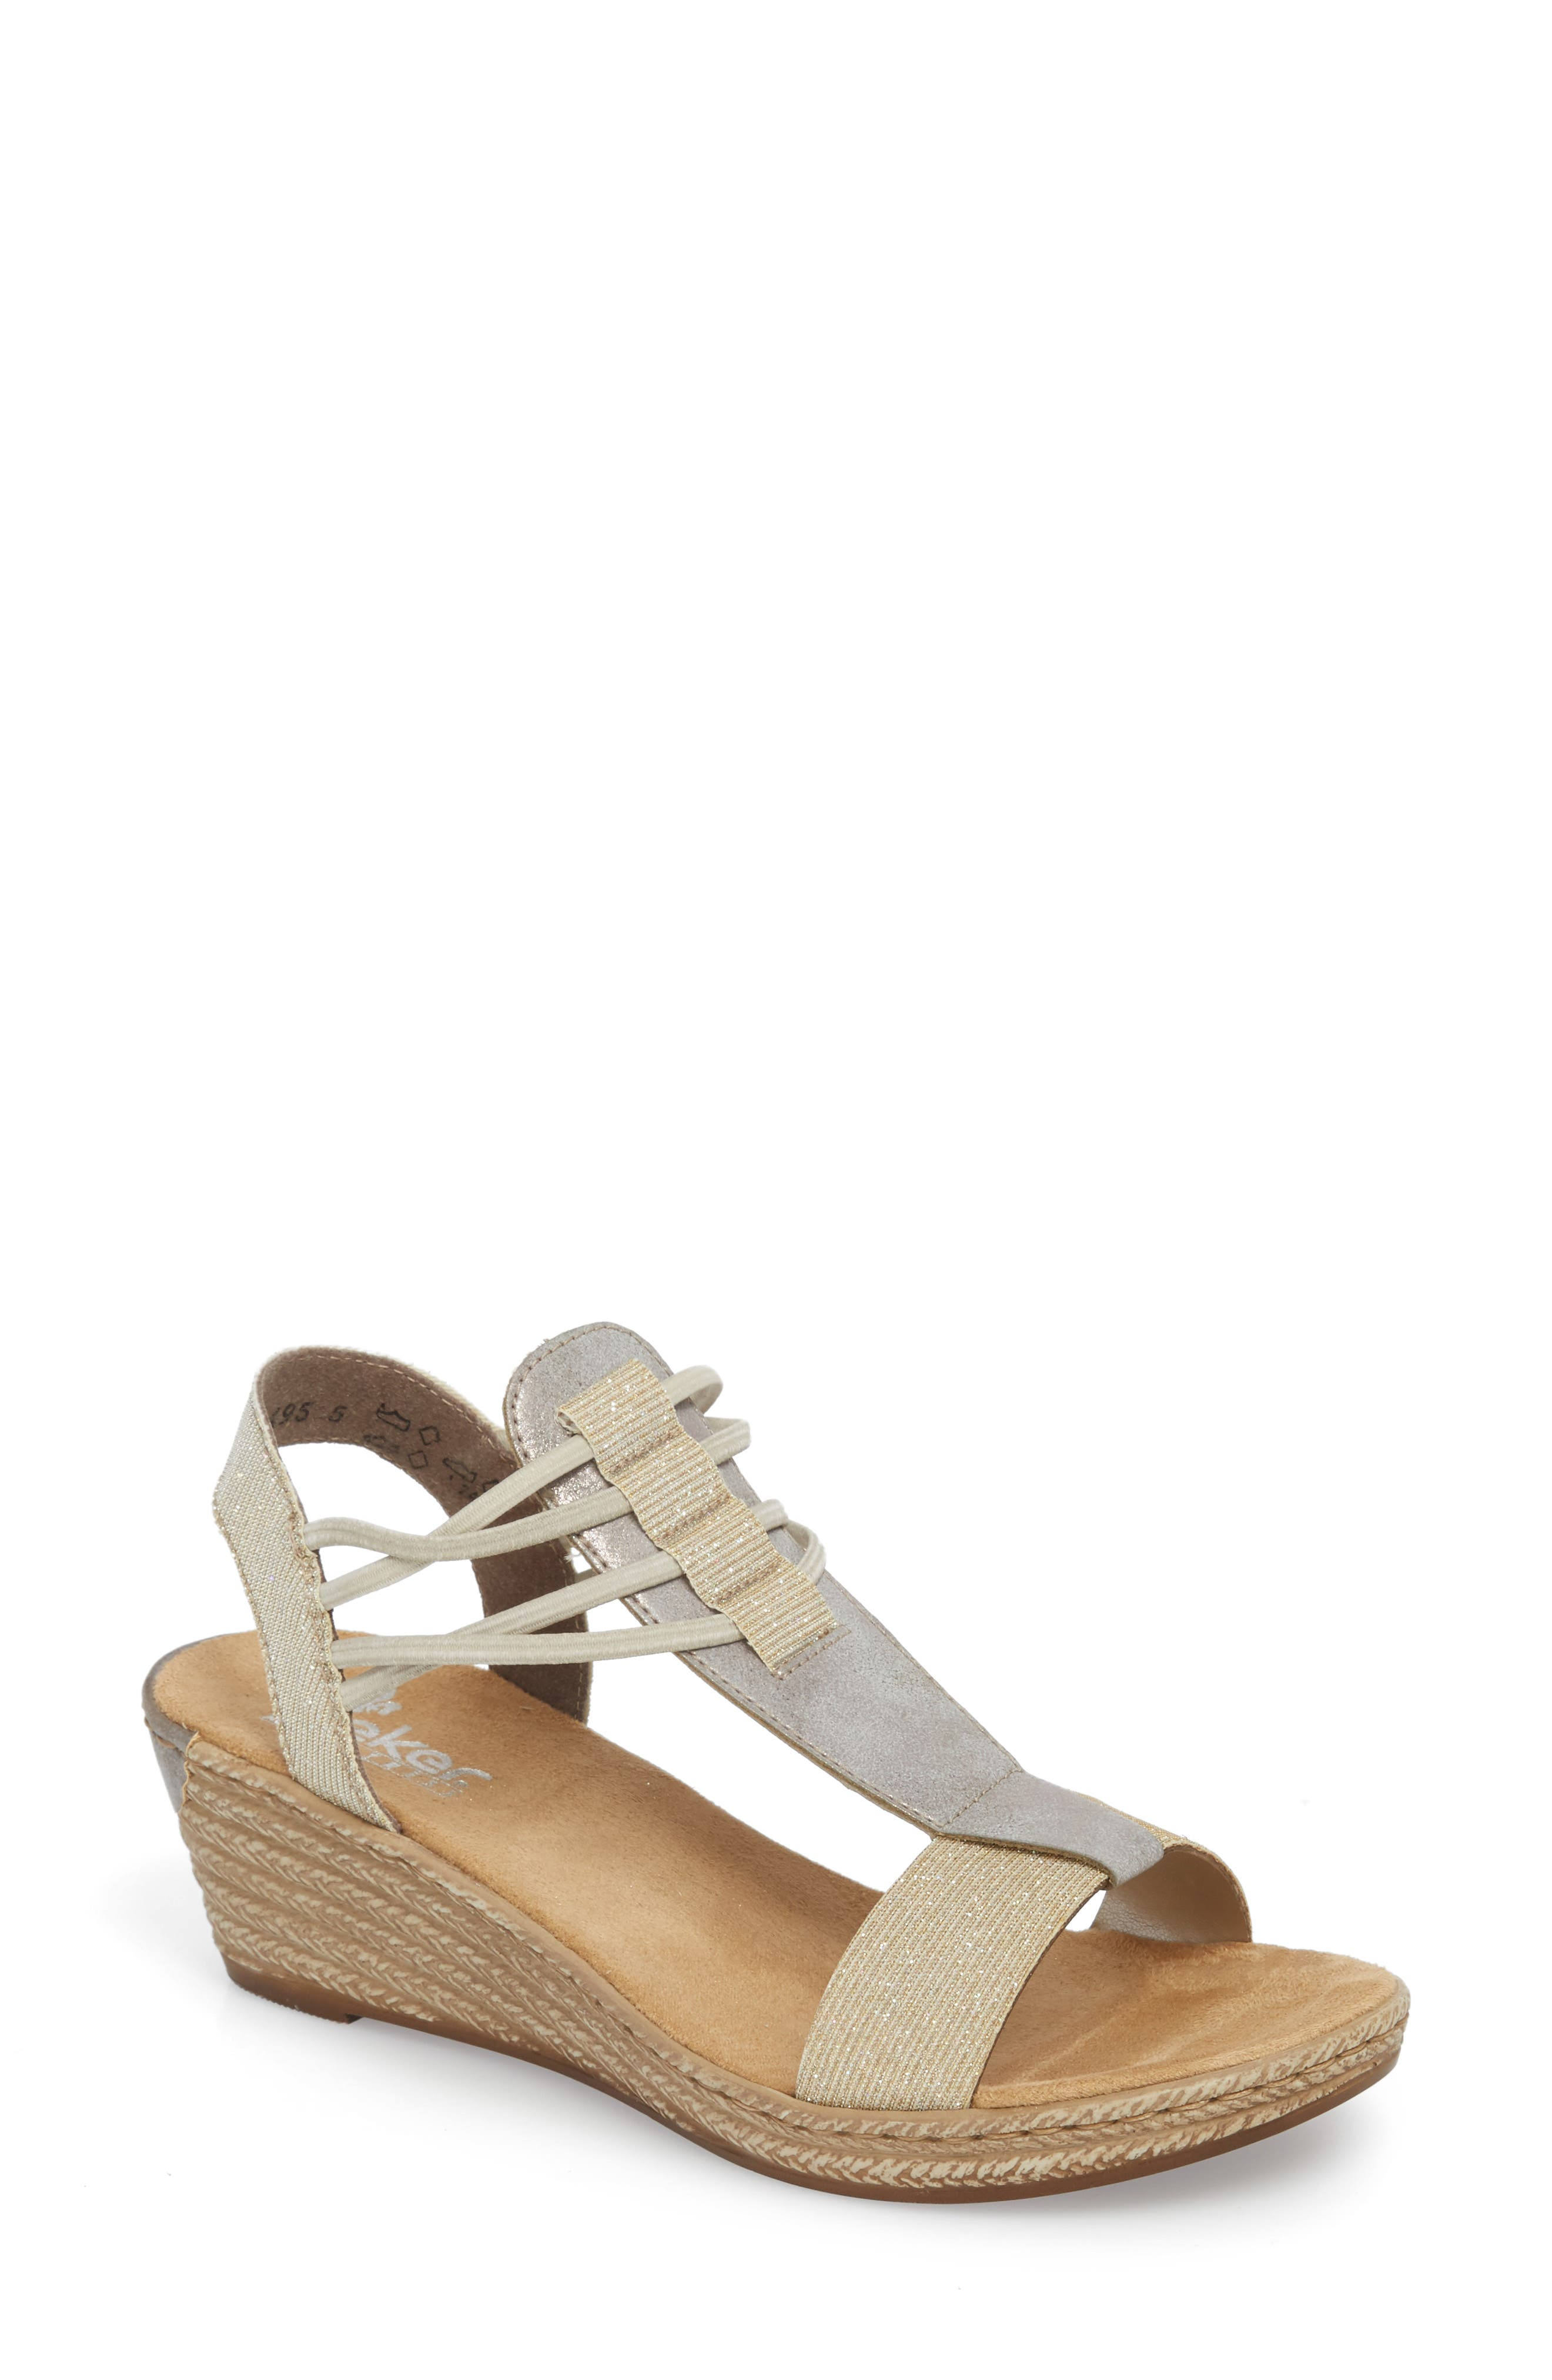 Fanni 22 Espadrille Wedge Sandal, Main, color, LIGHT GOLD/ GREY FABRIC